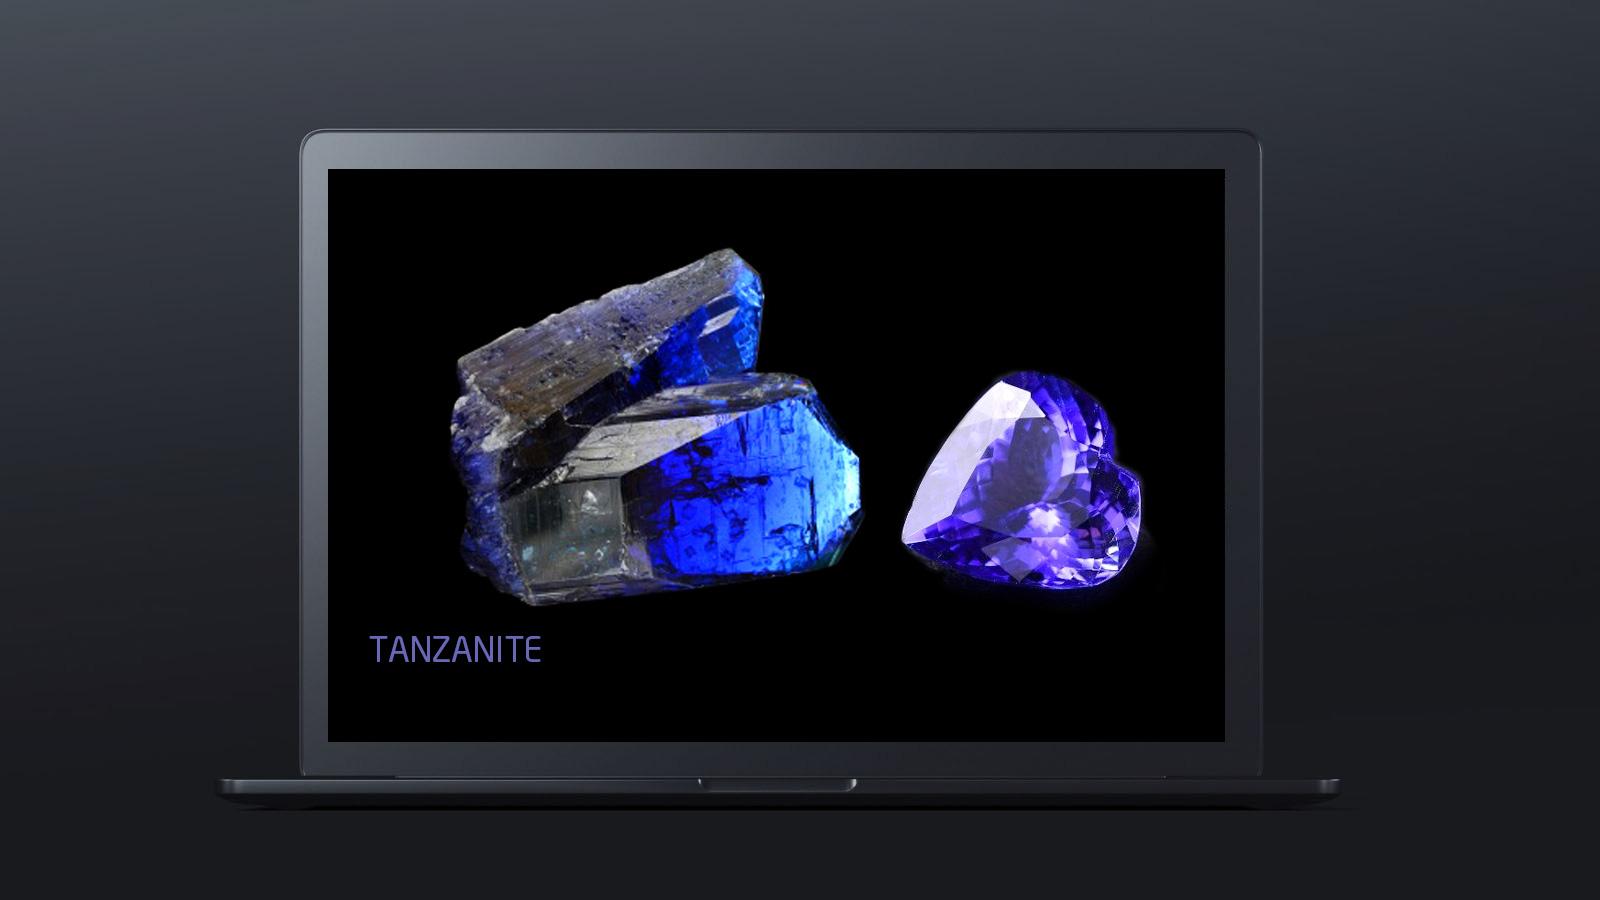 10 worlds rarest gemstones TANZANITE 2  - ده گوهر کمیاب دنیا کدامند؟